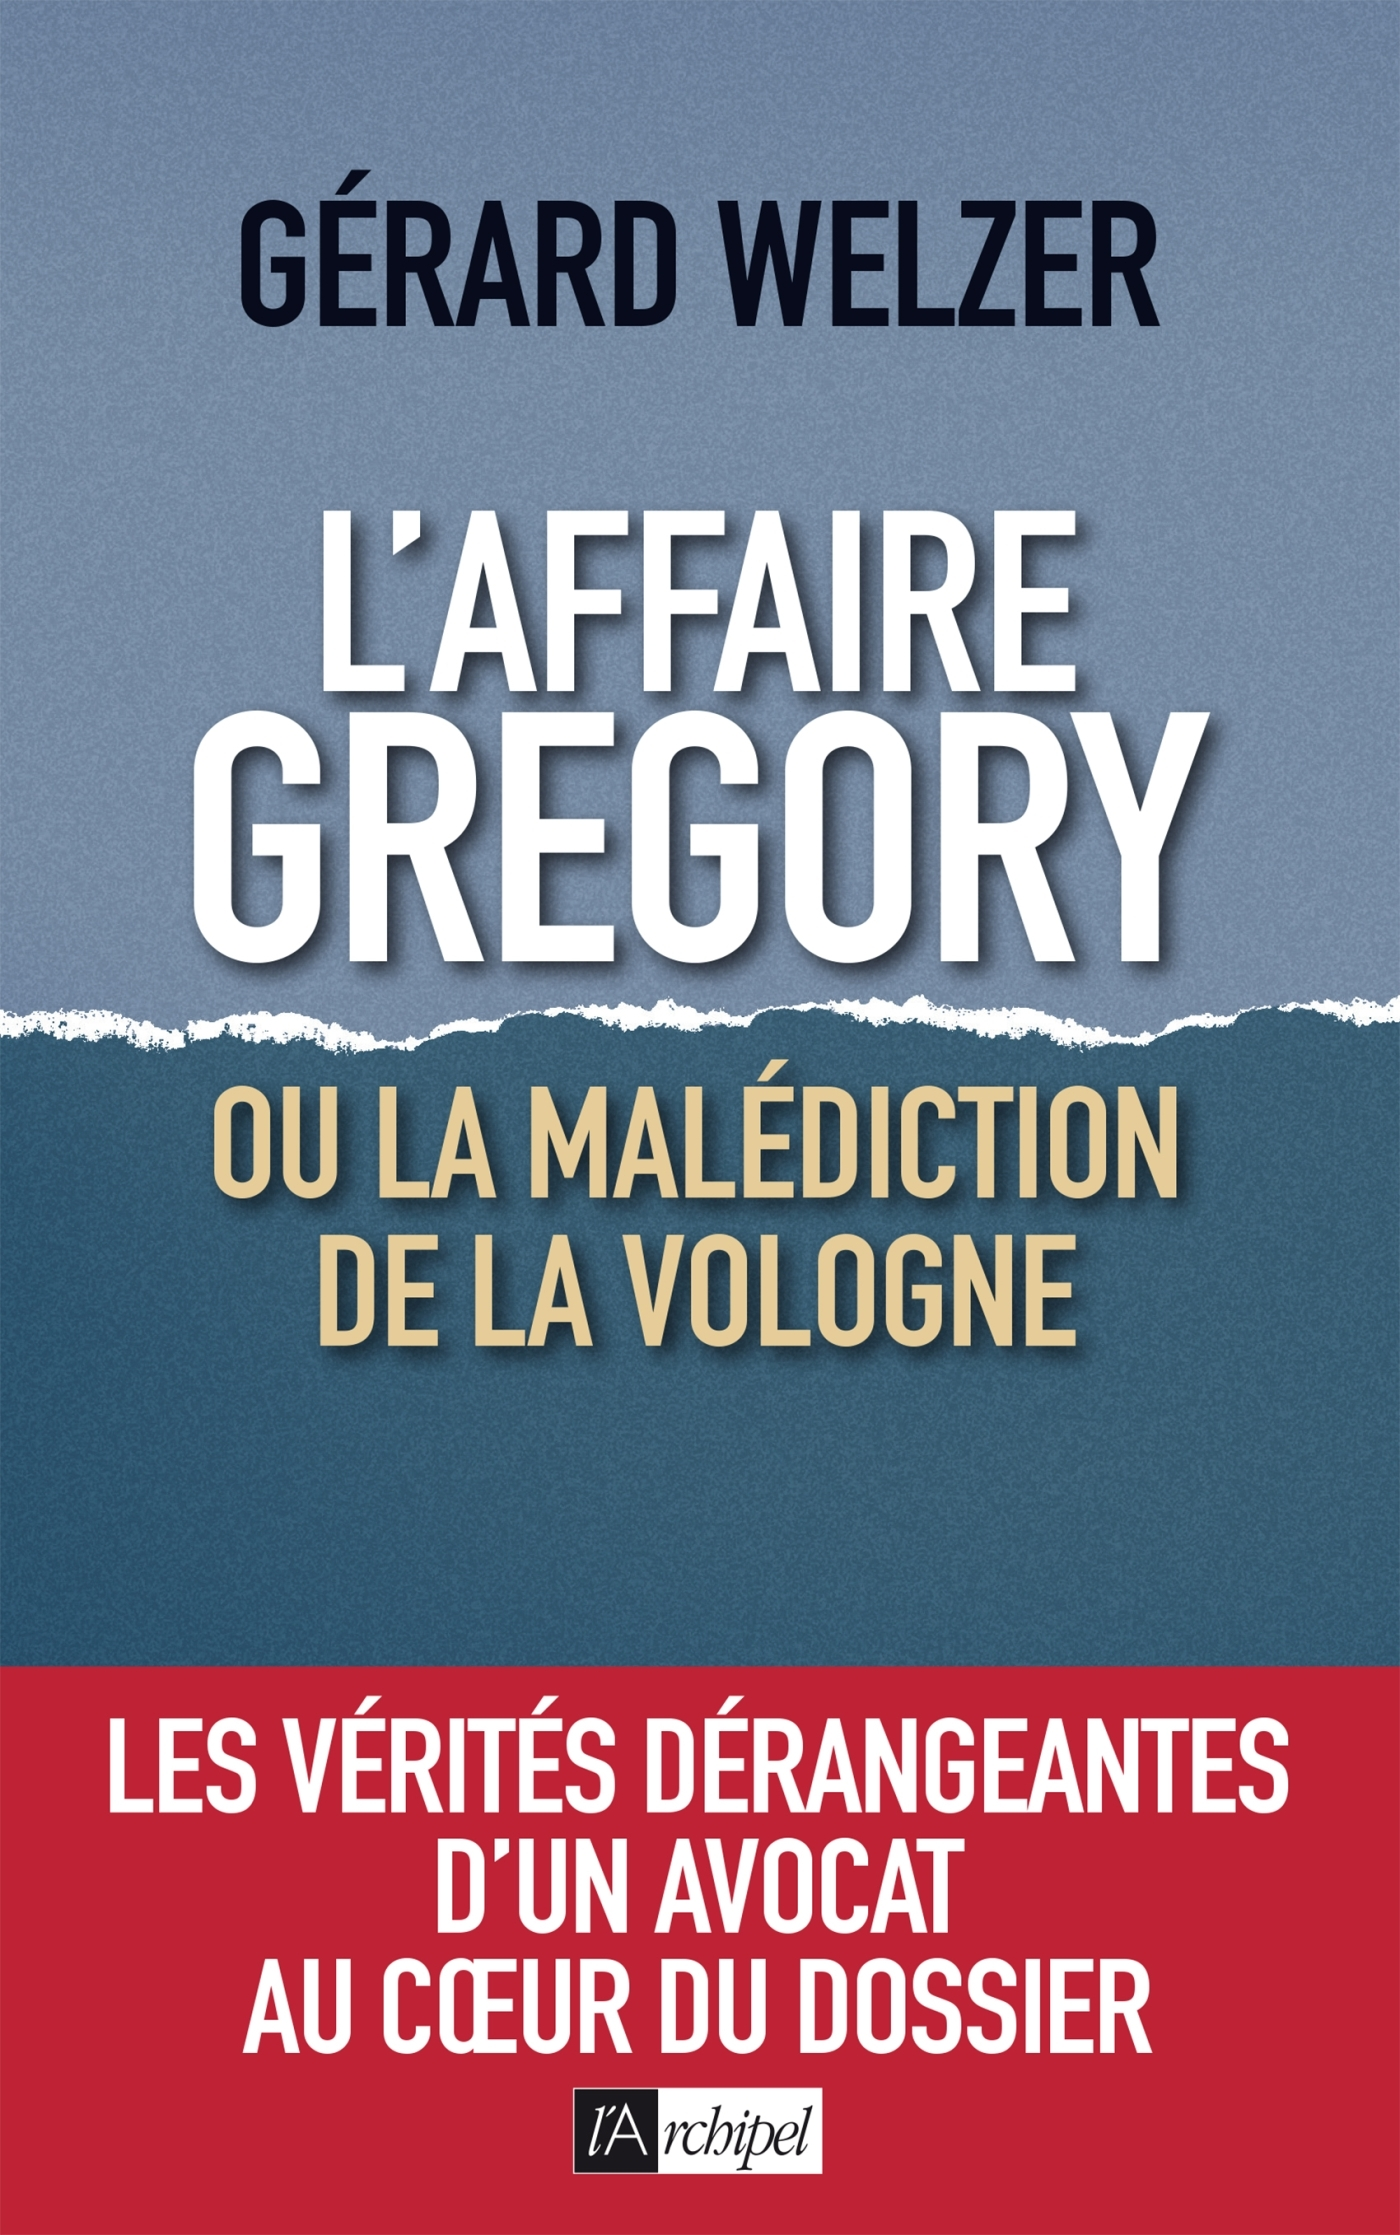 L'AFFAIRE GREGORY